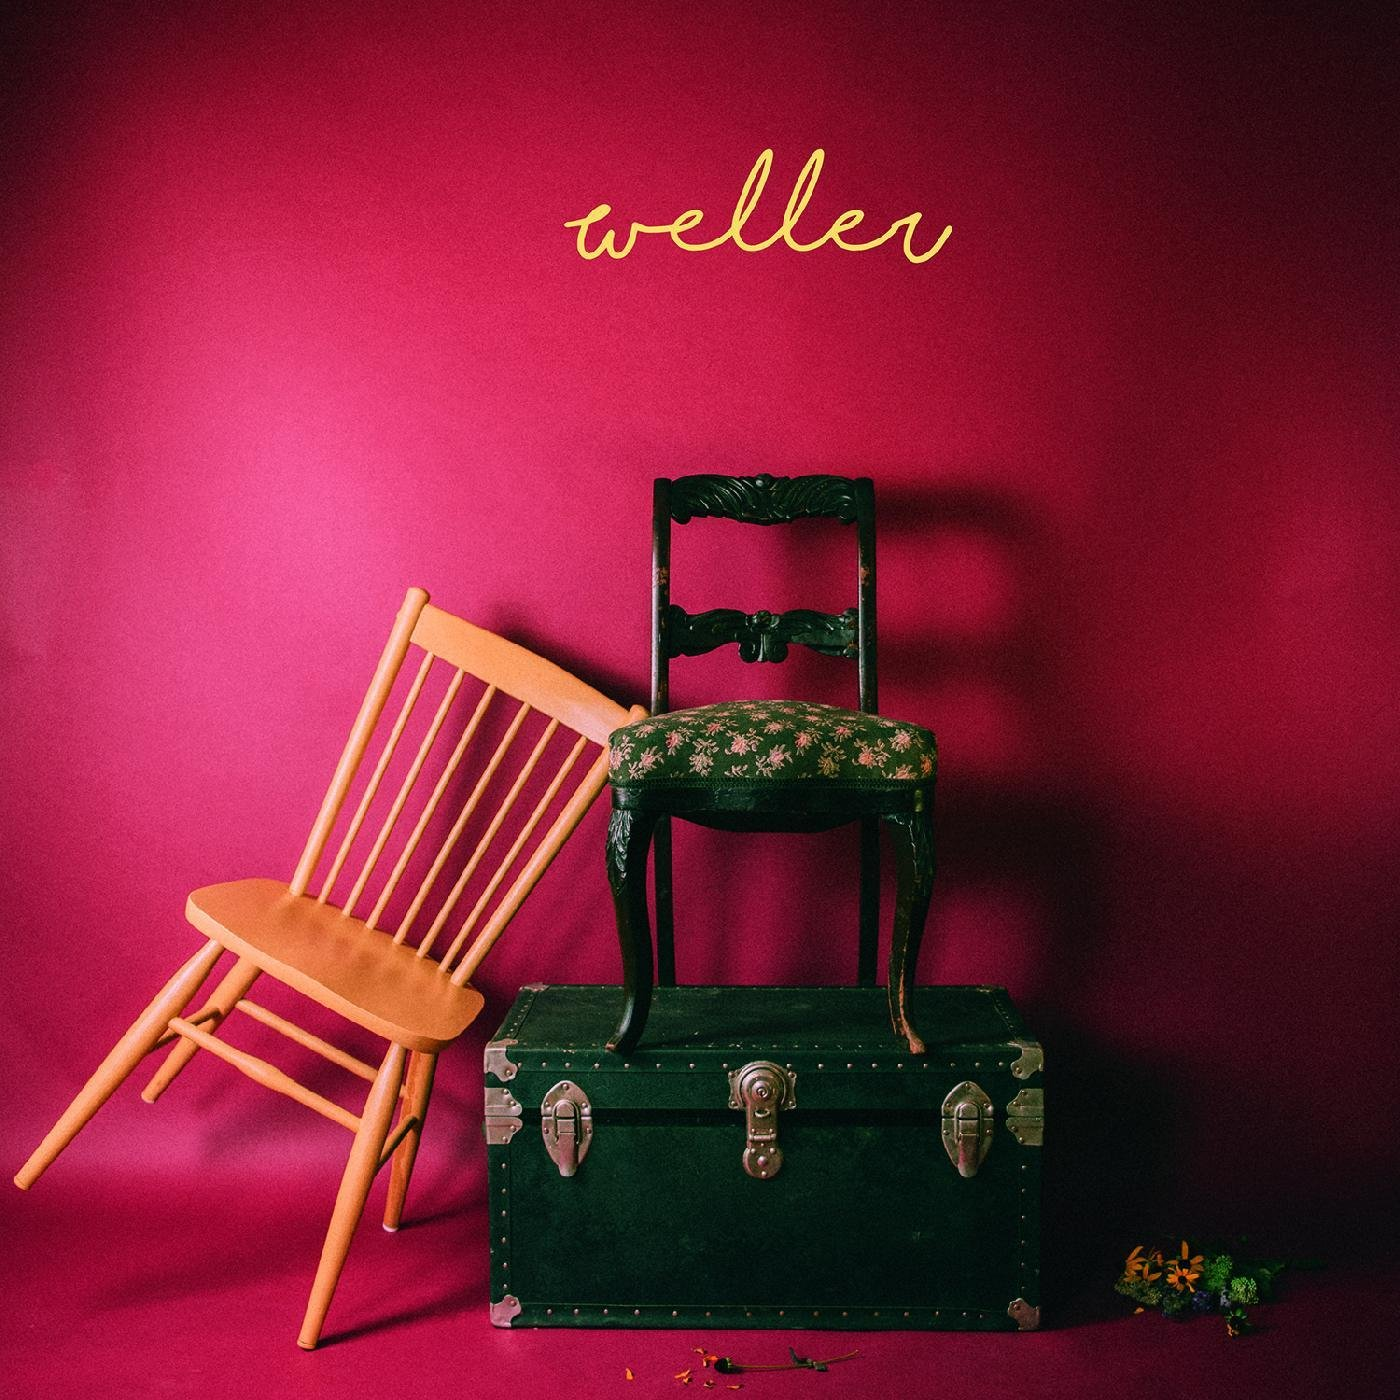 Cassette : Weller - Weller (Cassette)